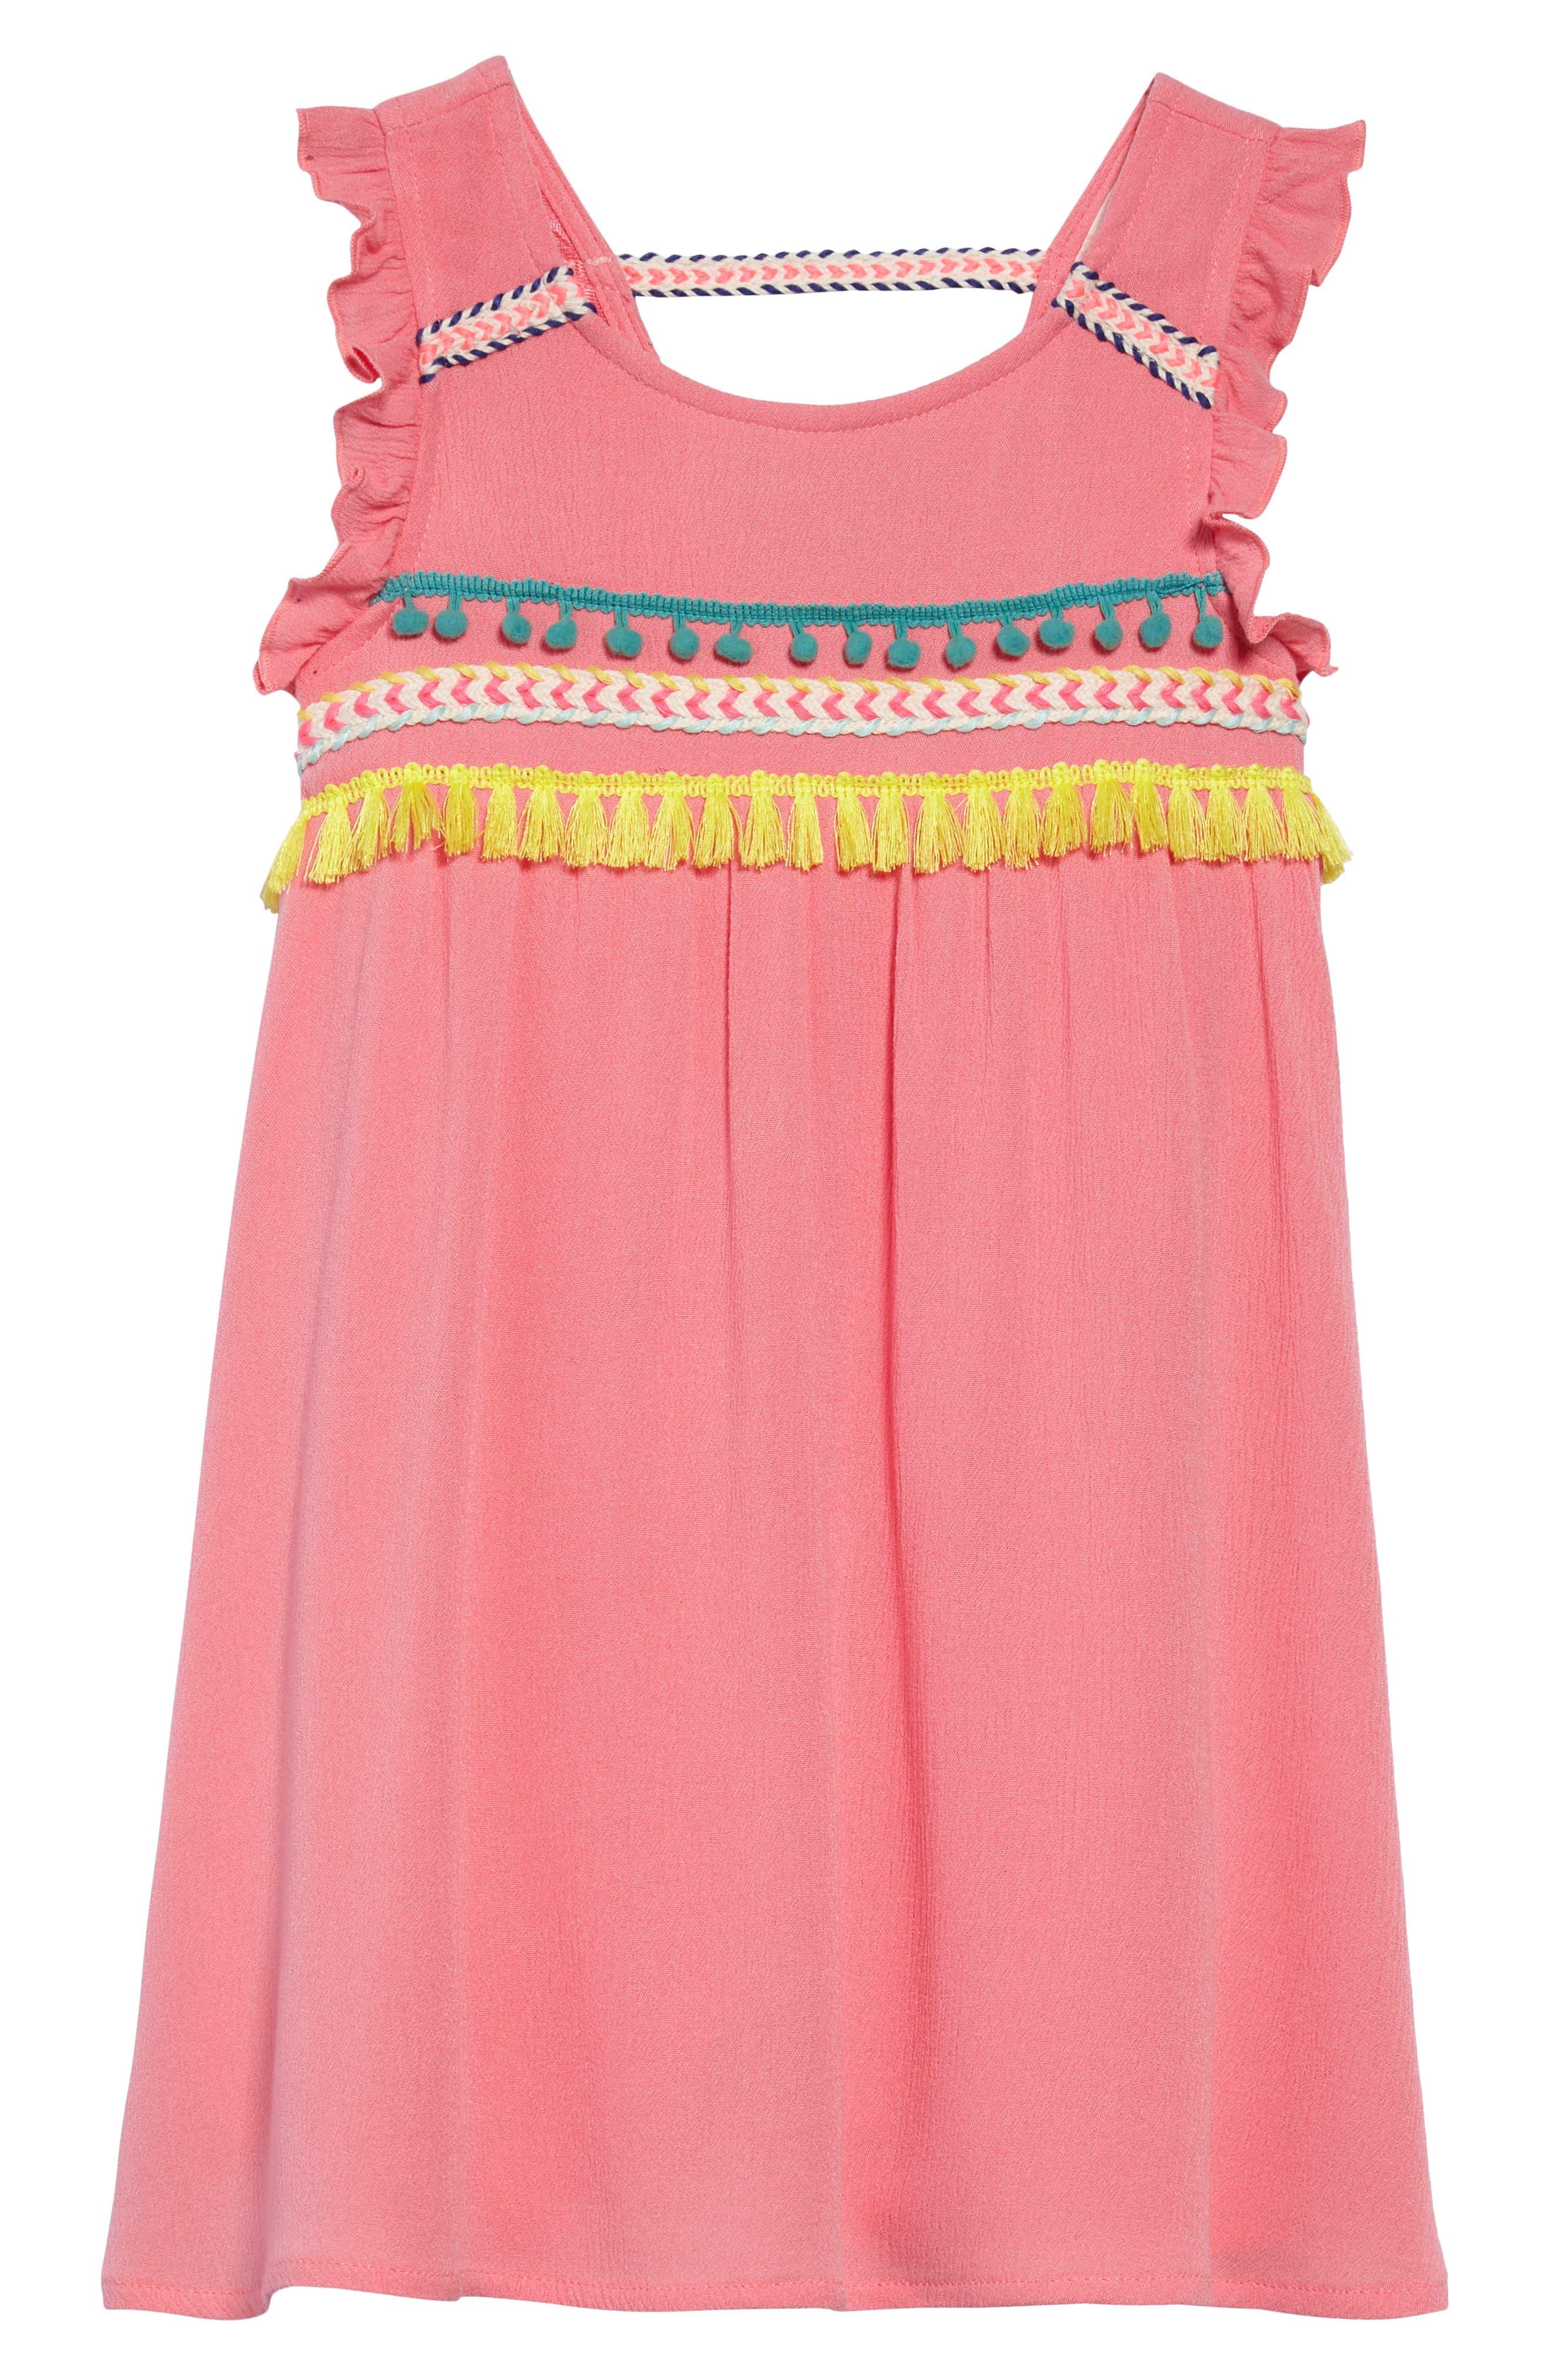 Trim Babydoll Dress,                         Main,                         color, 951